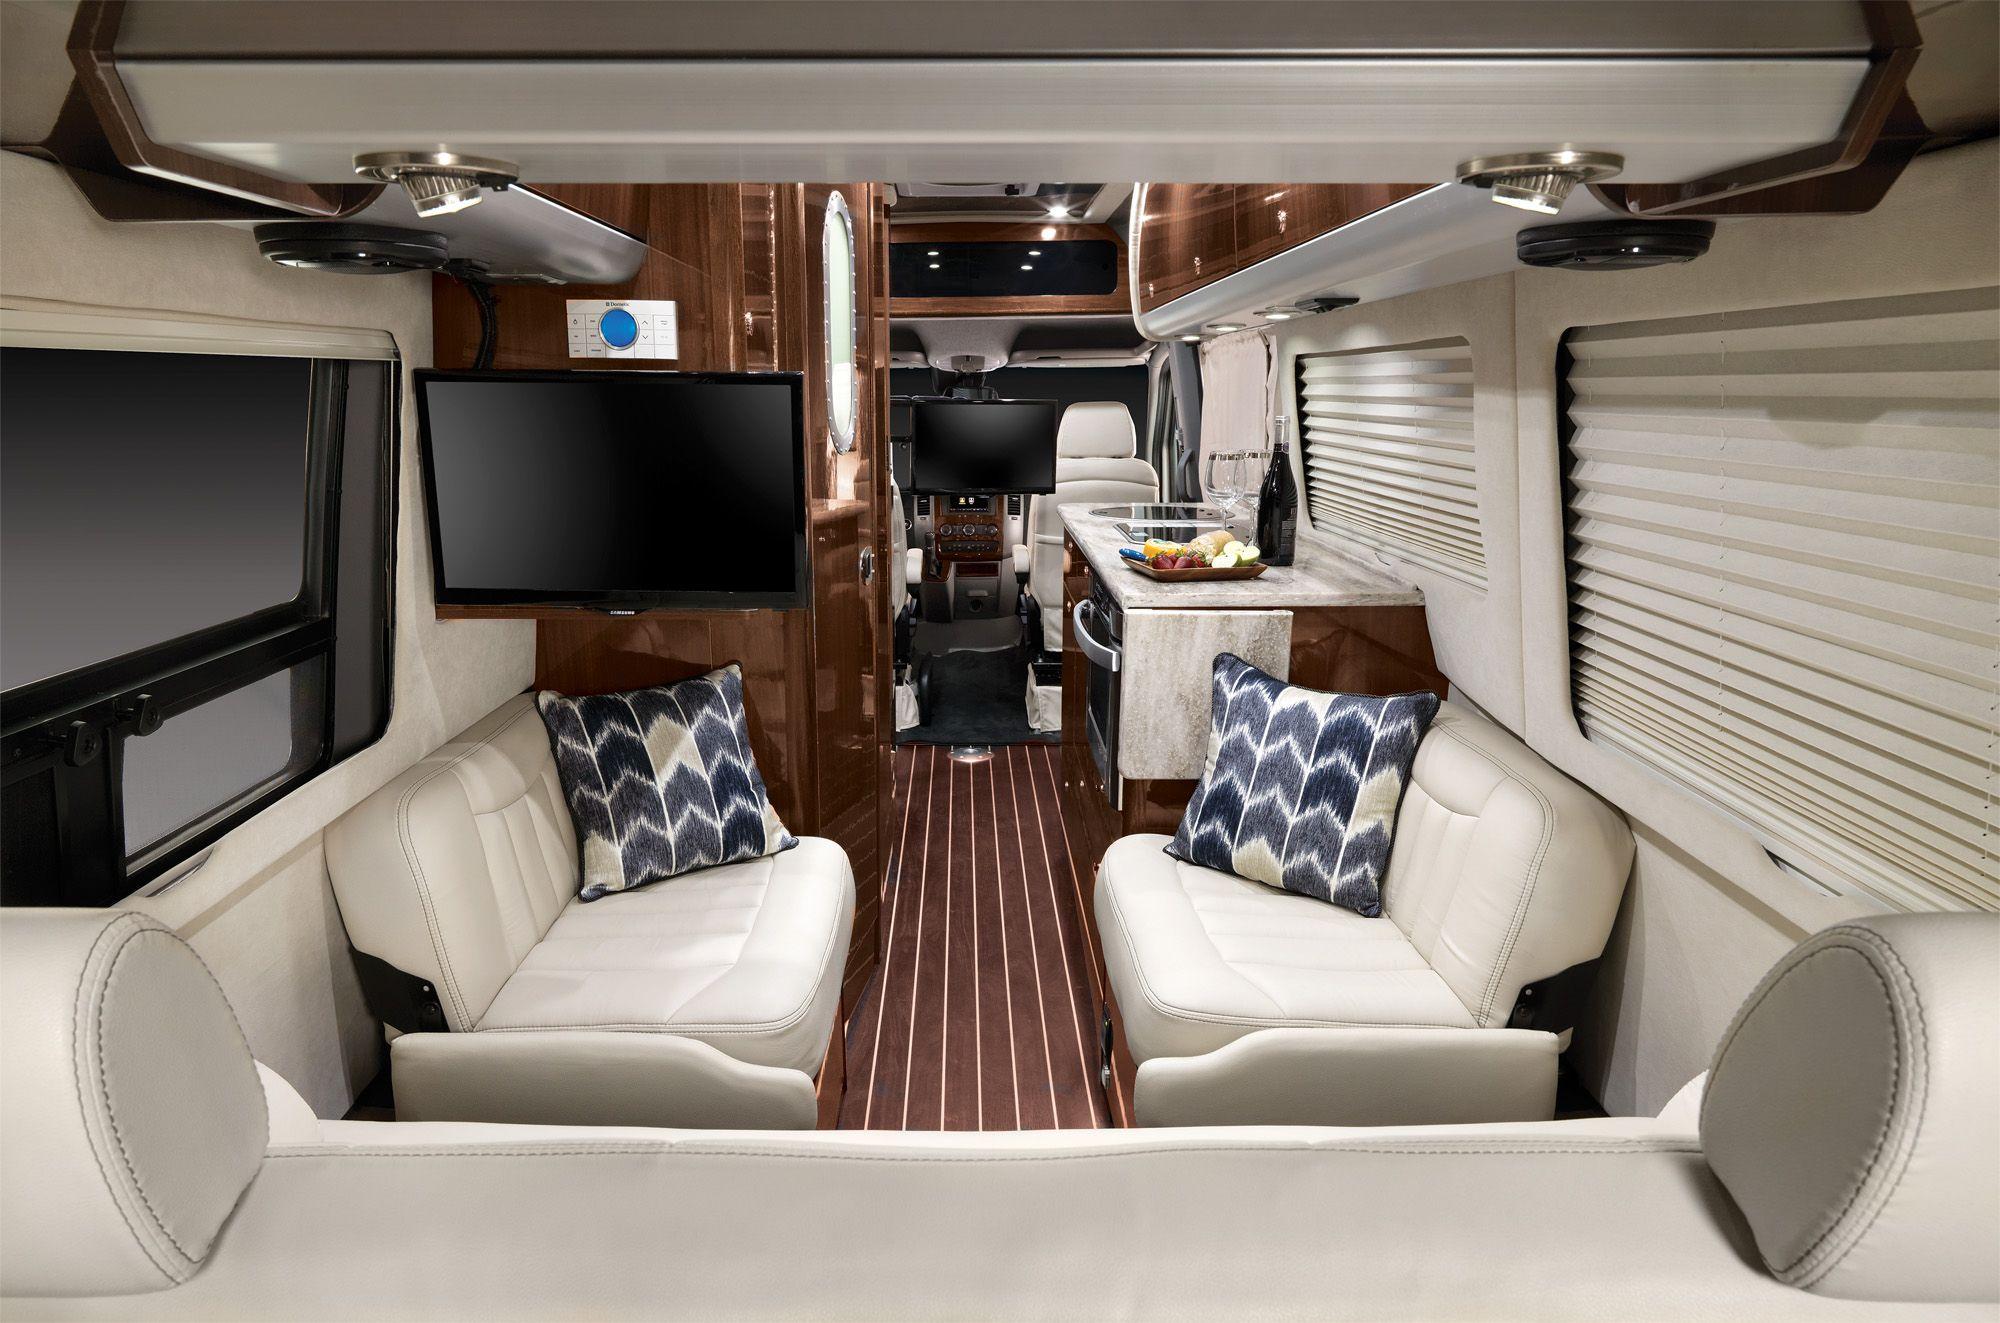 Airstream Announces New 24 Foot Mercedes Touring Coach